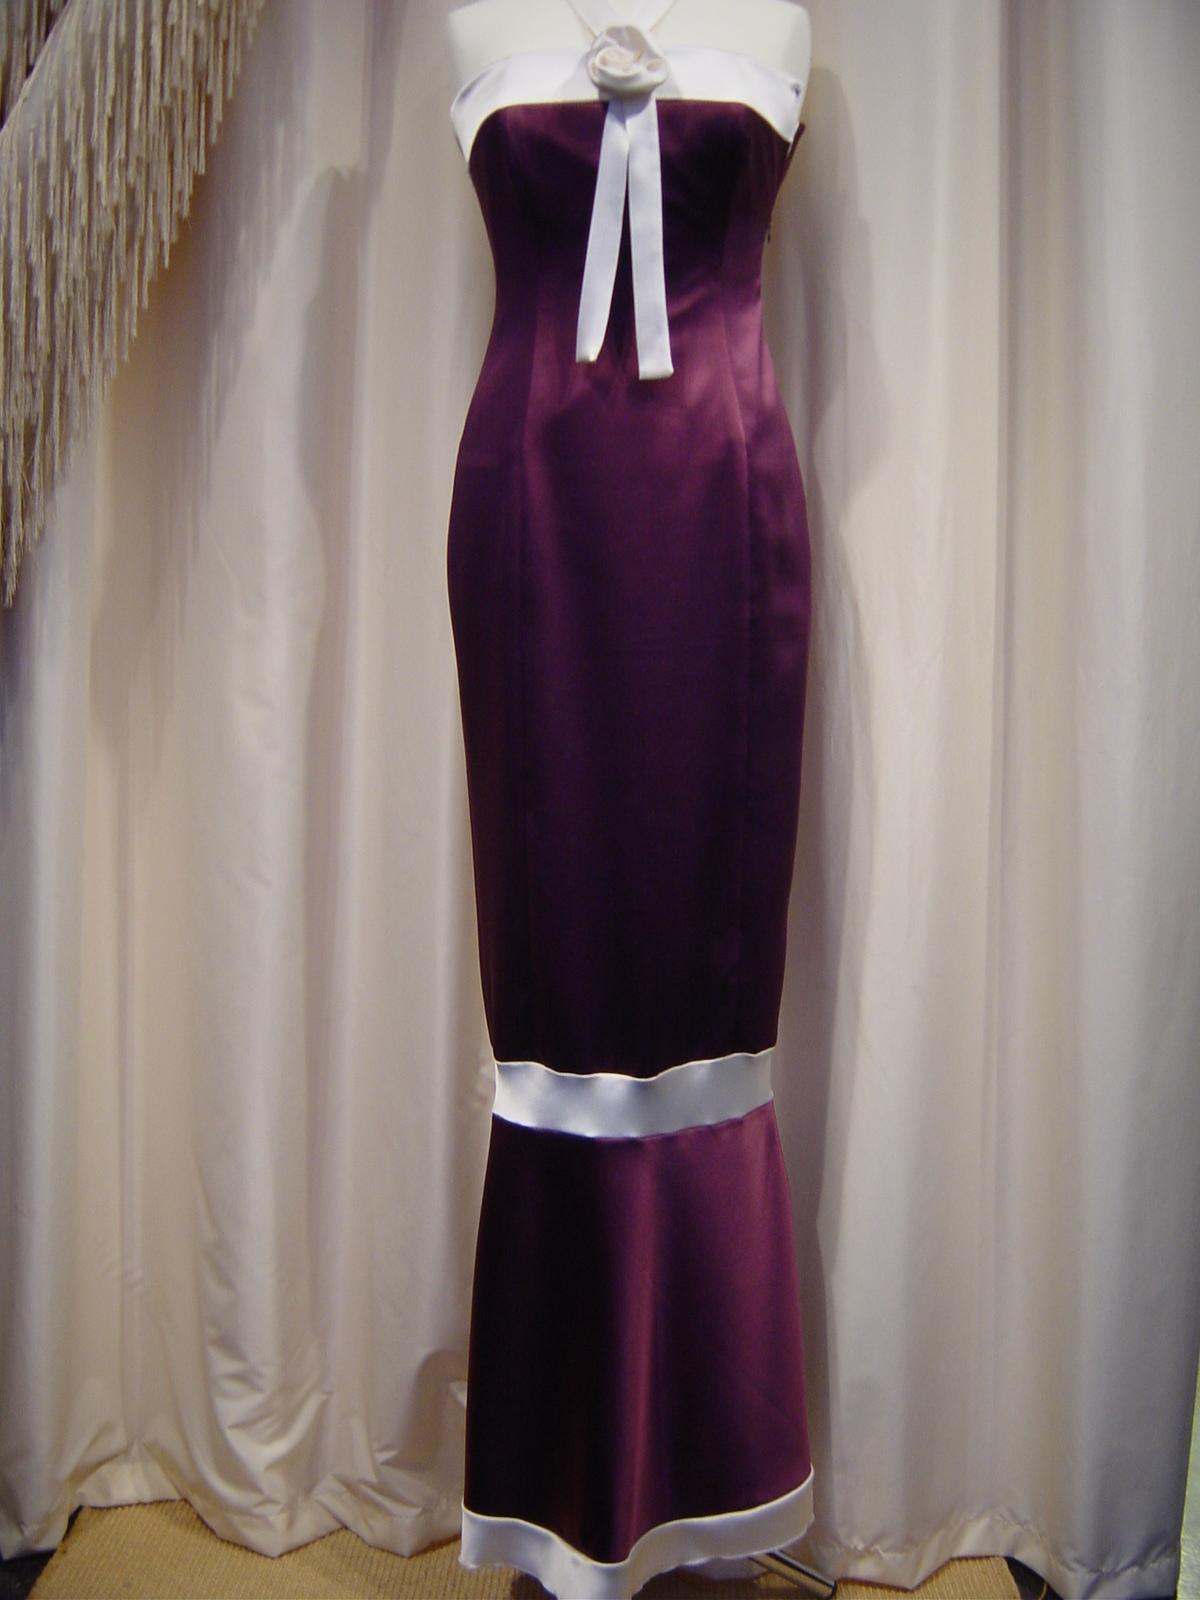 moncler it – vesta moncler Romania fes valentino moncler magazin tricou moncler femei